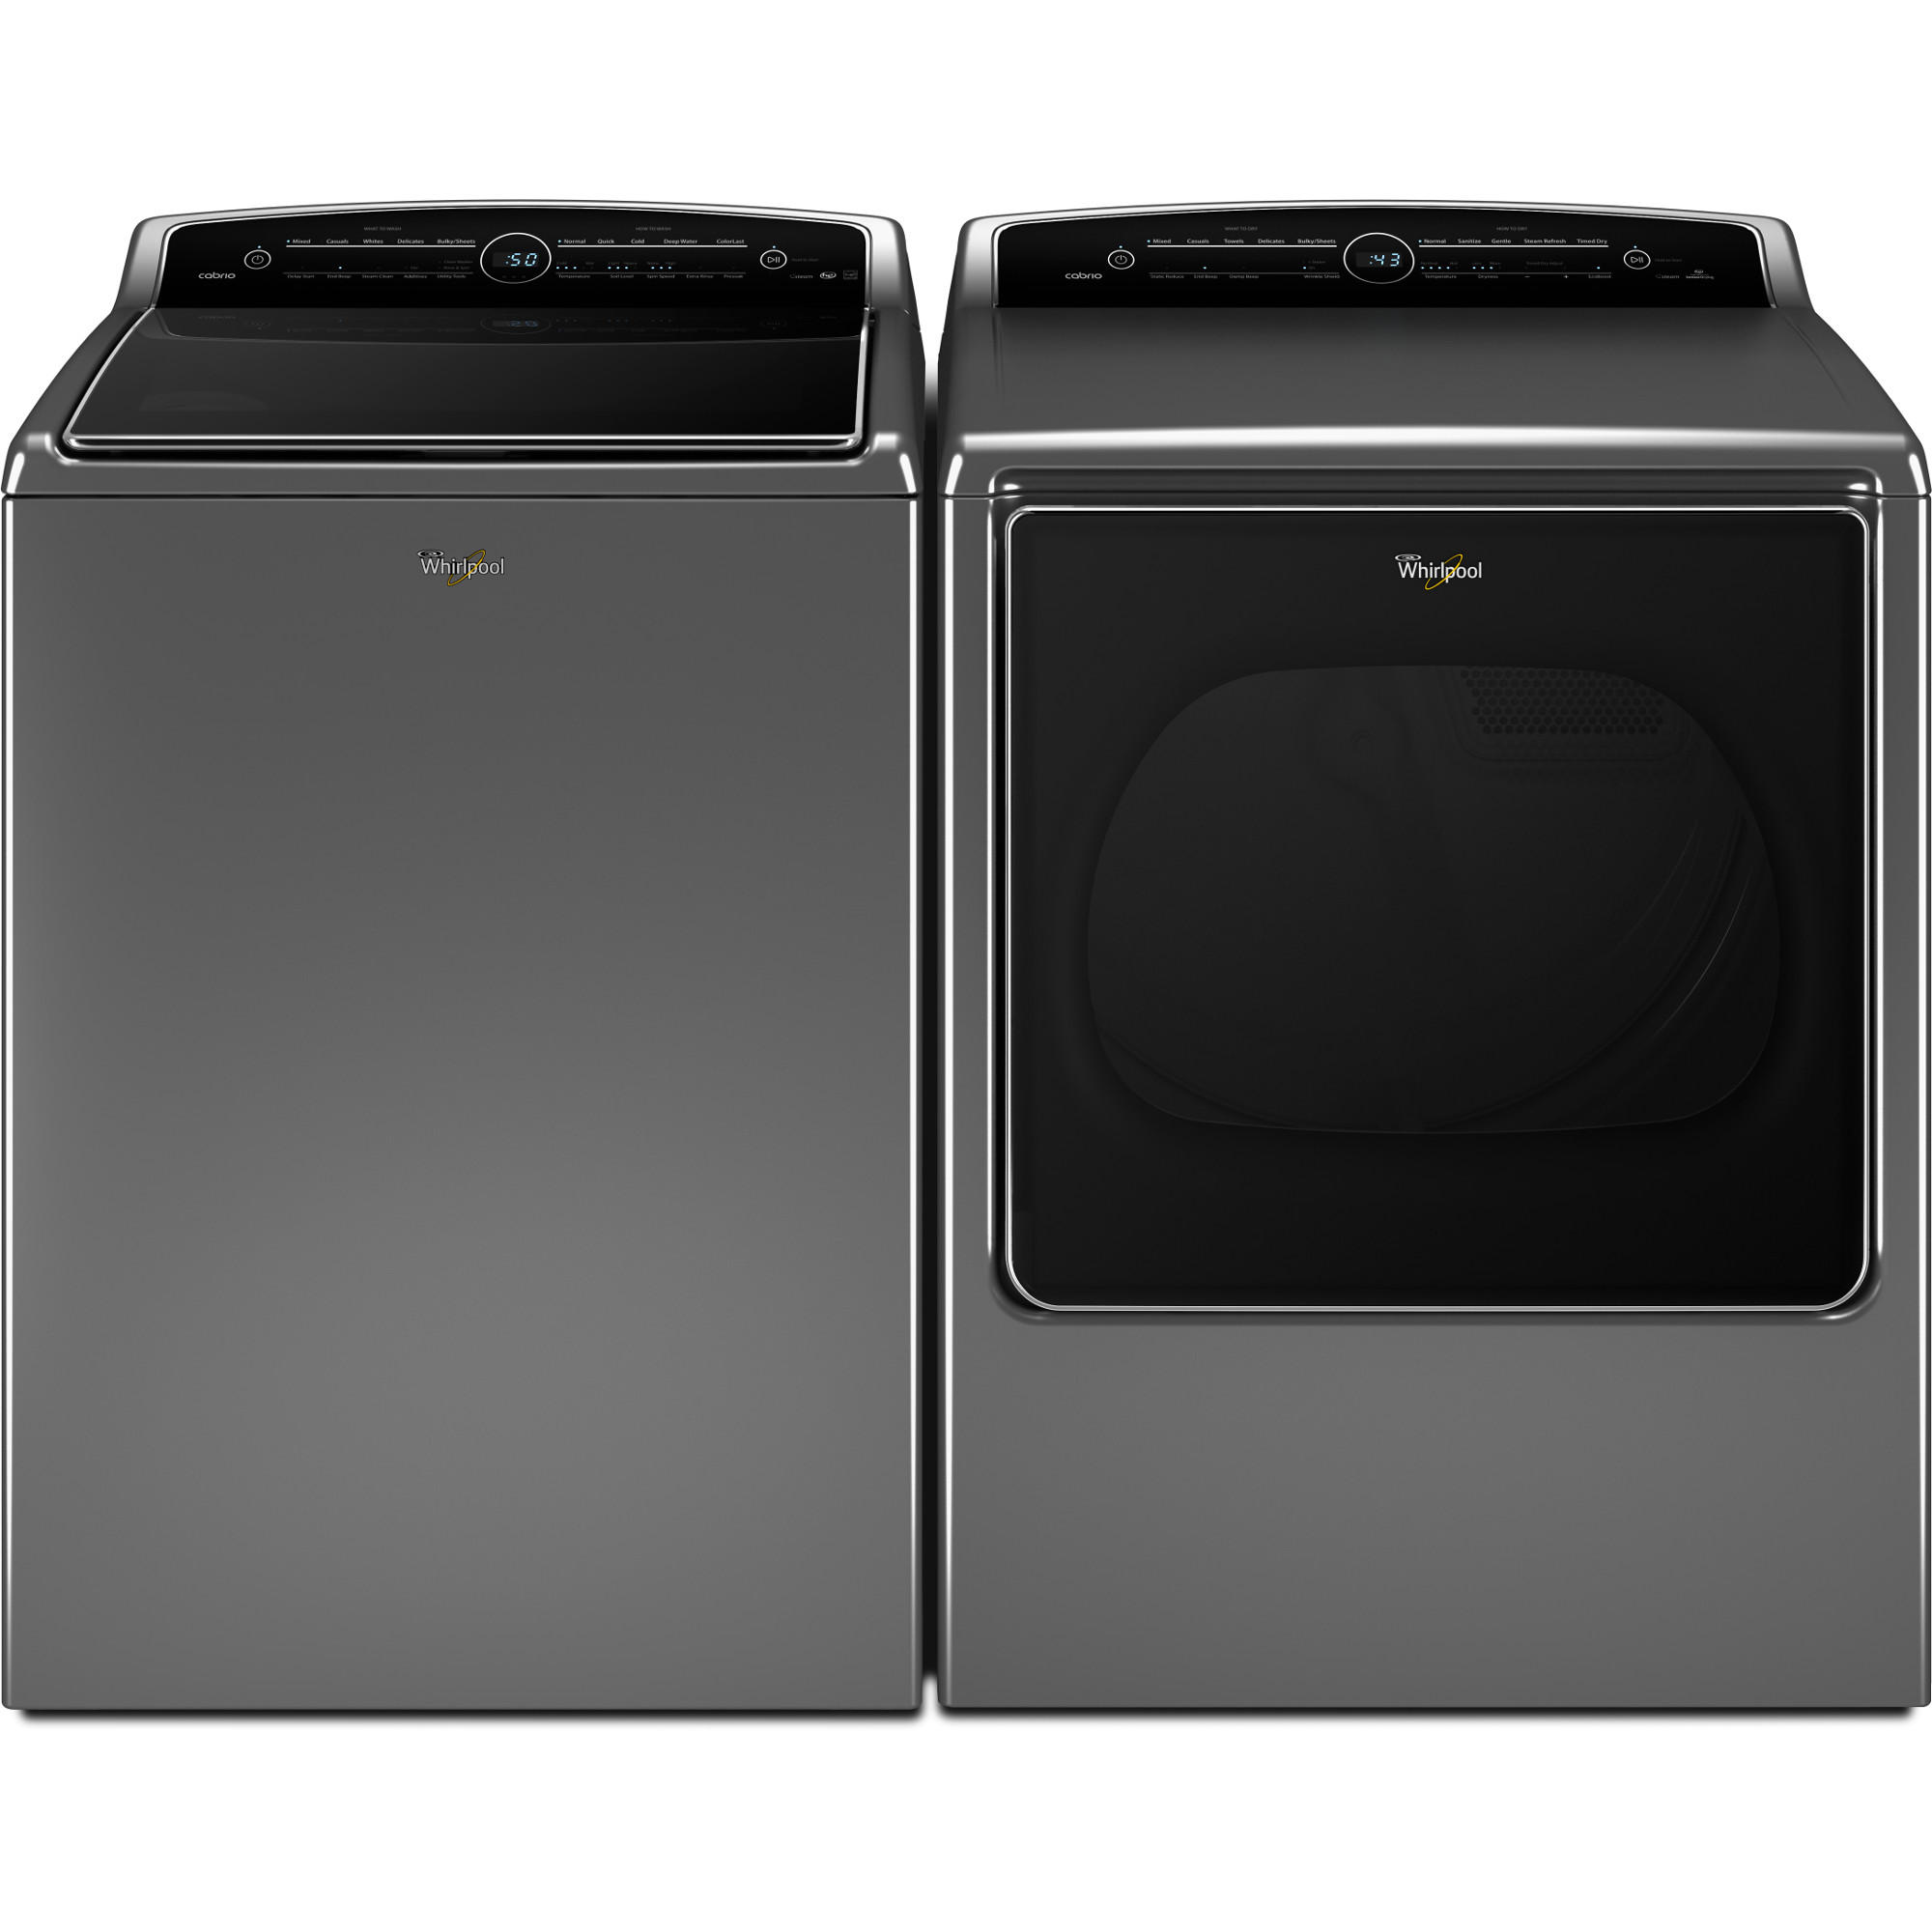 5.3 cu. ft. Cabrio® Washer & 8.8 cu. ft. Dryer - Chrome Shadow